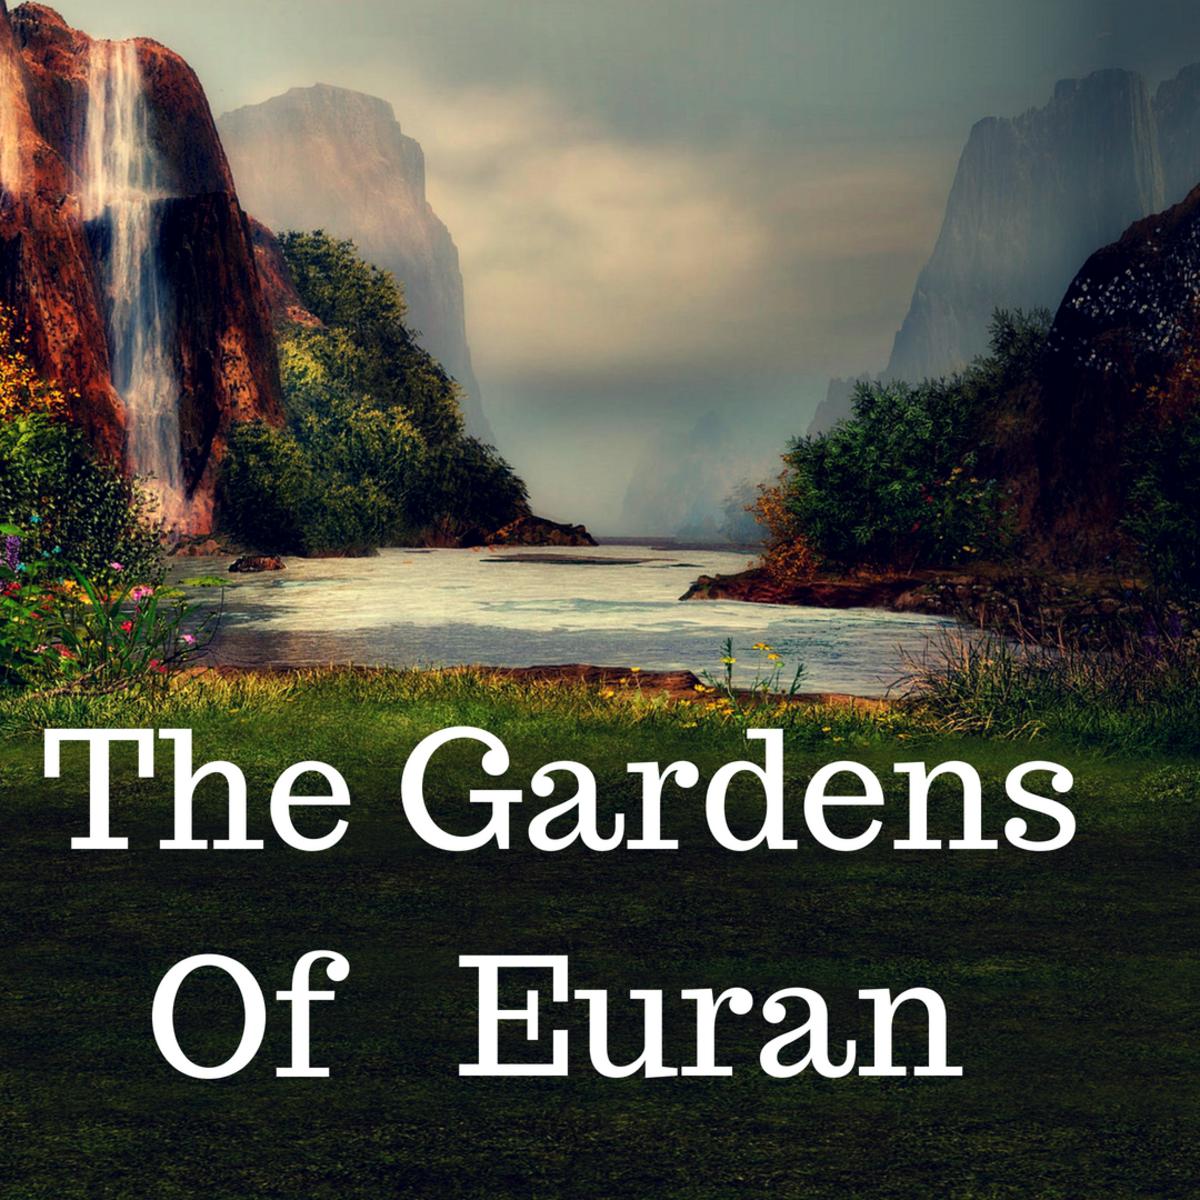 The Gardens of Euran: Chapter 1 (a novella)